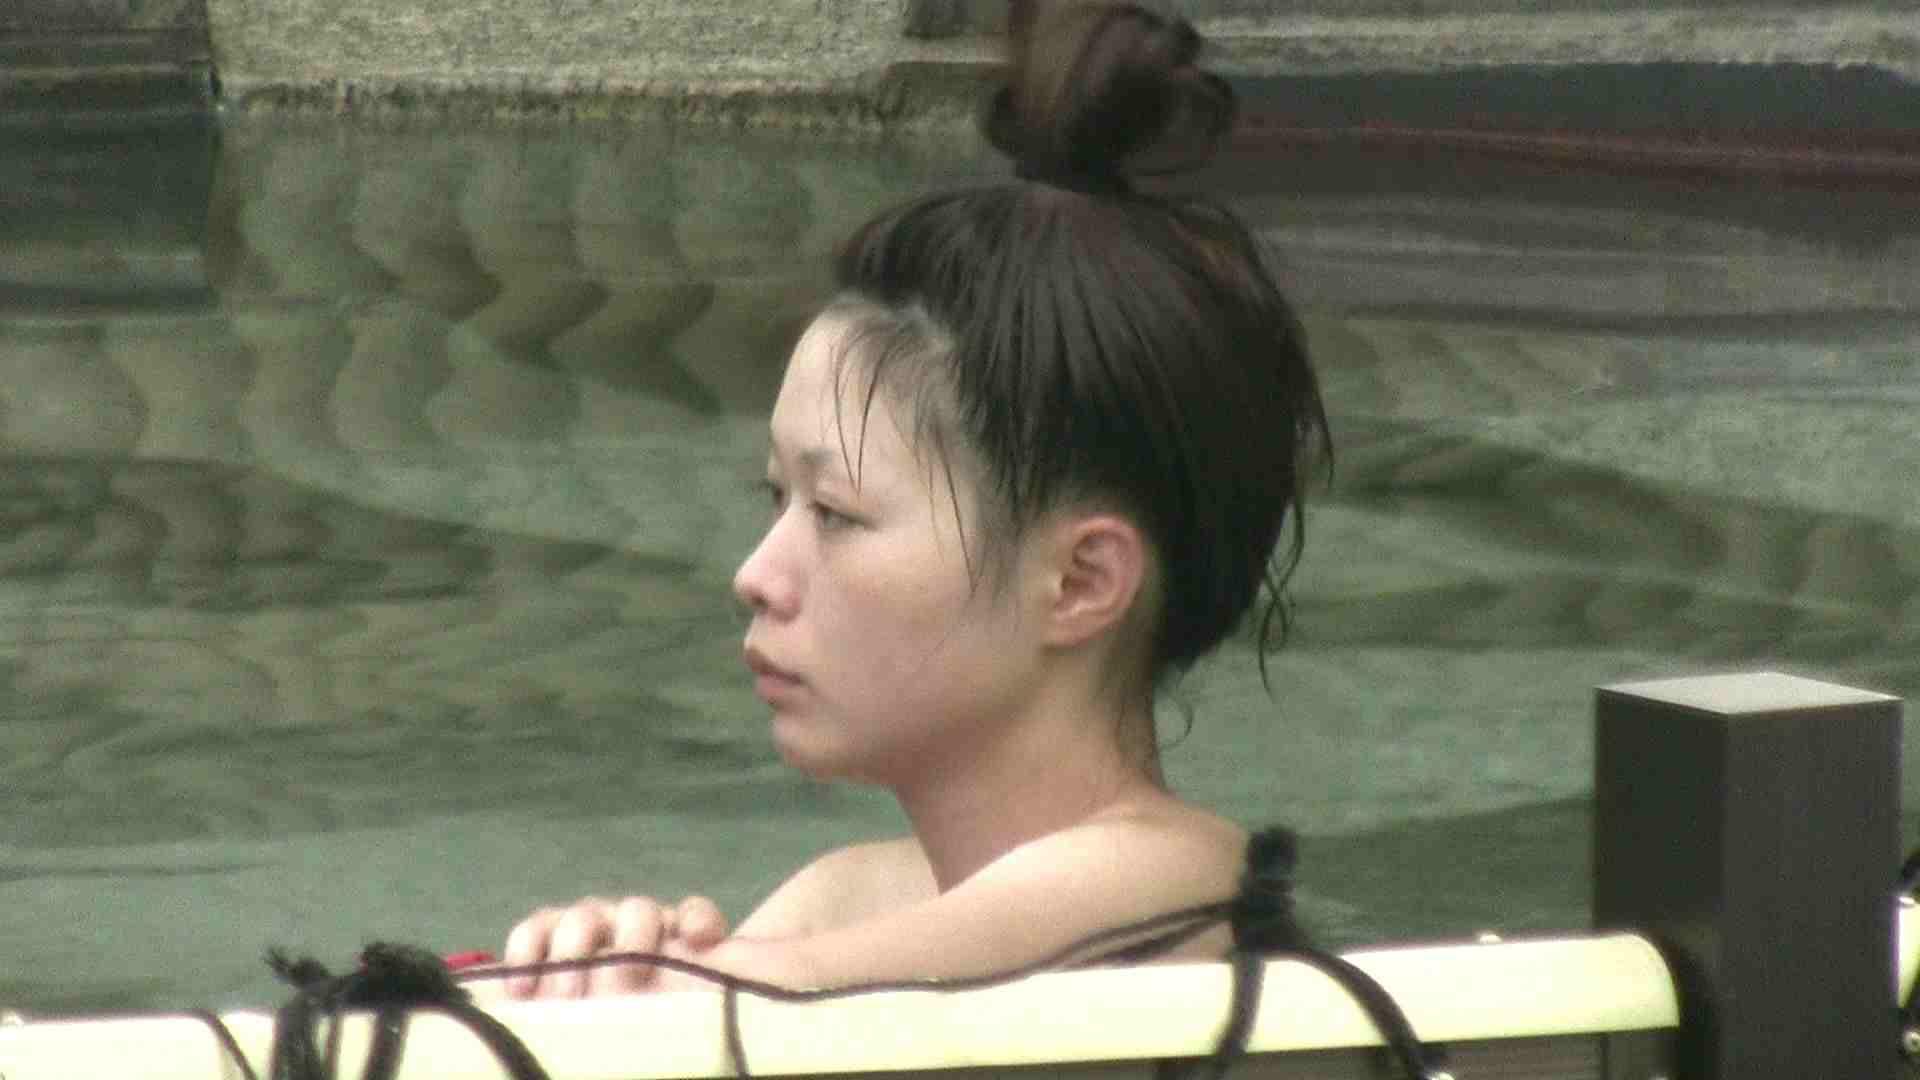 Aquaな露天風呂Vol.189 露天 おめこ無修正動画無料 90連発 63